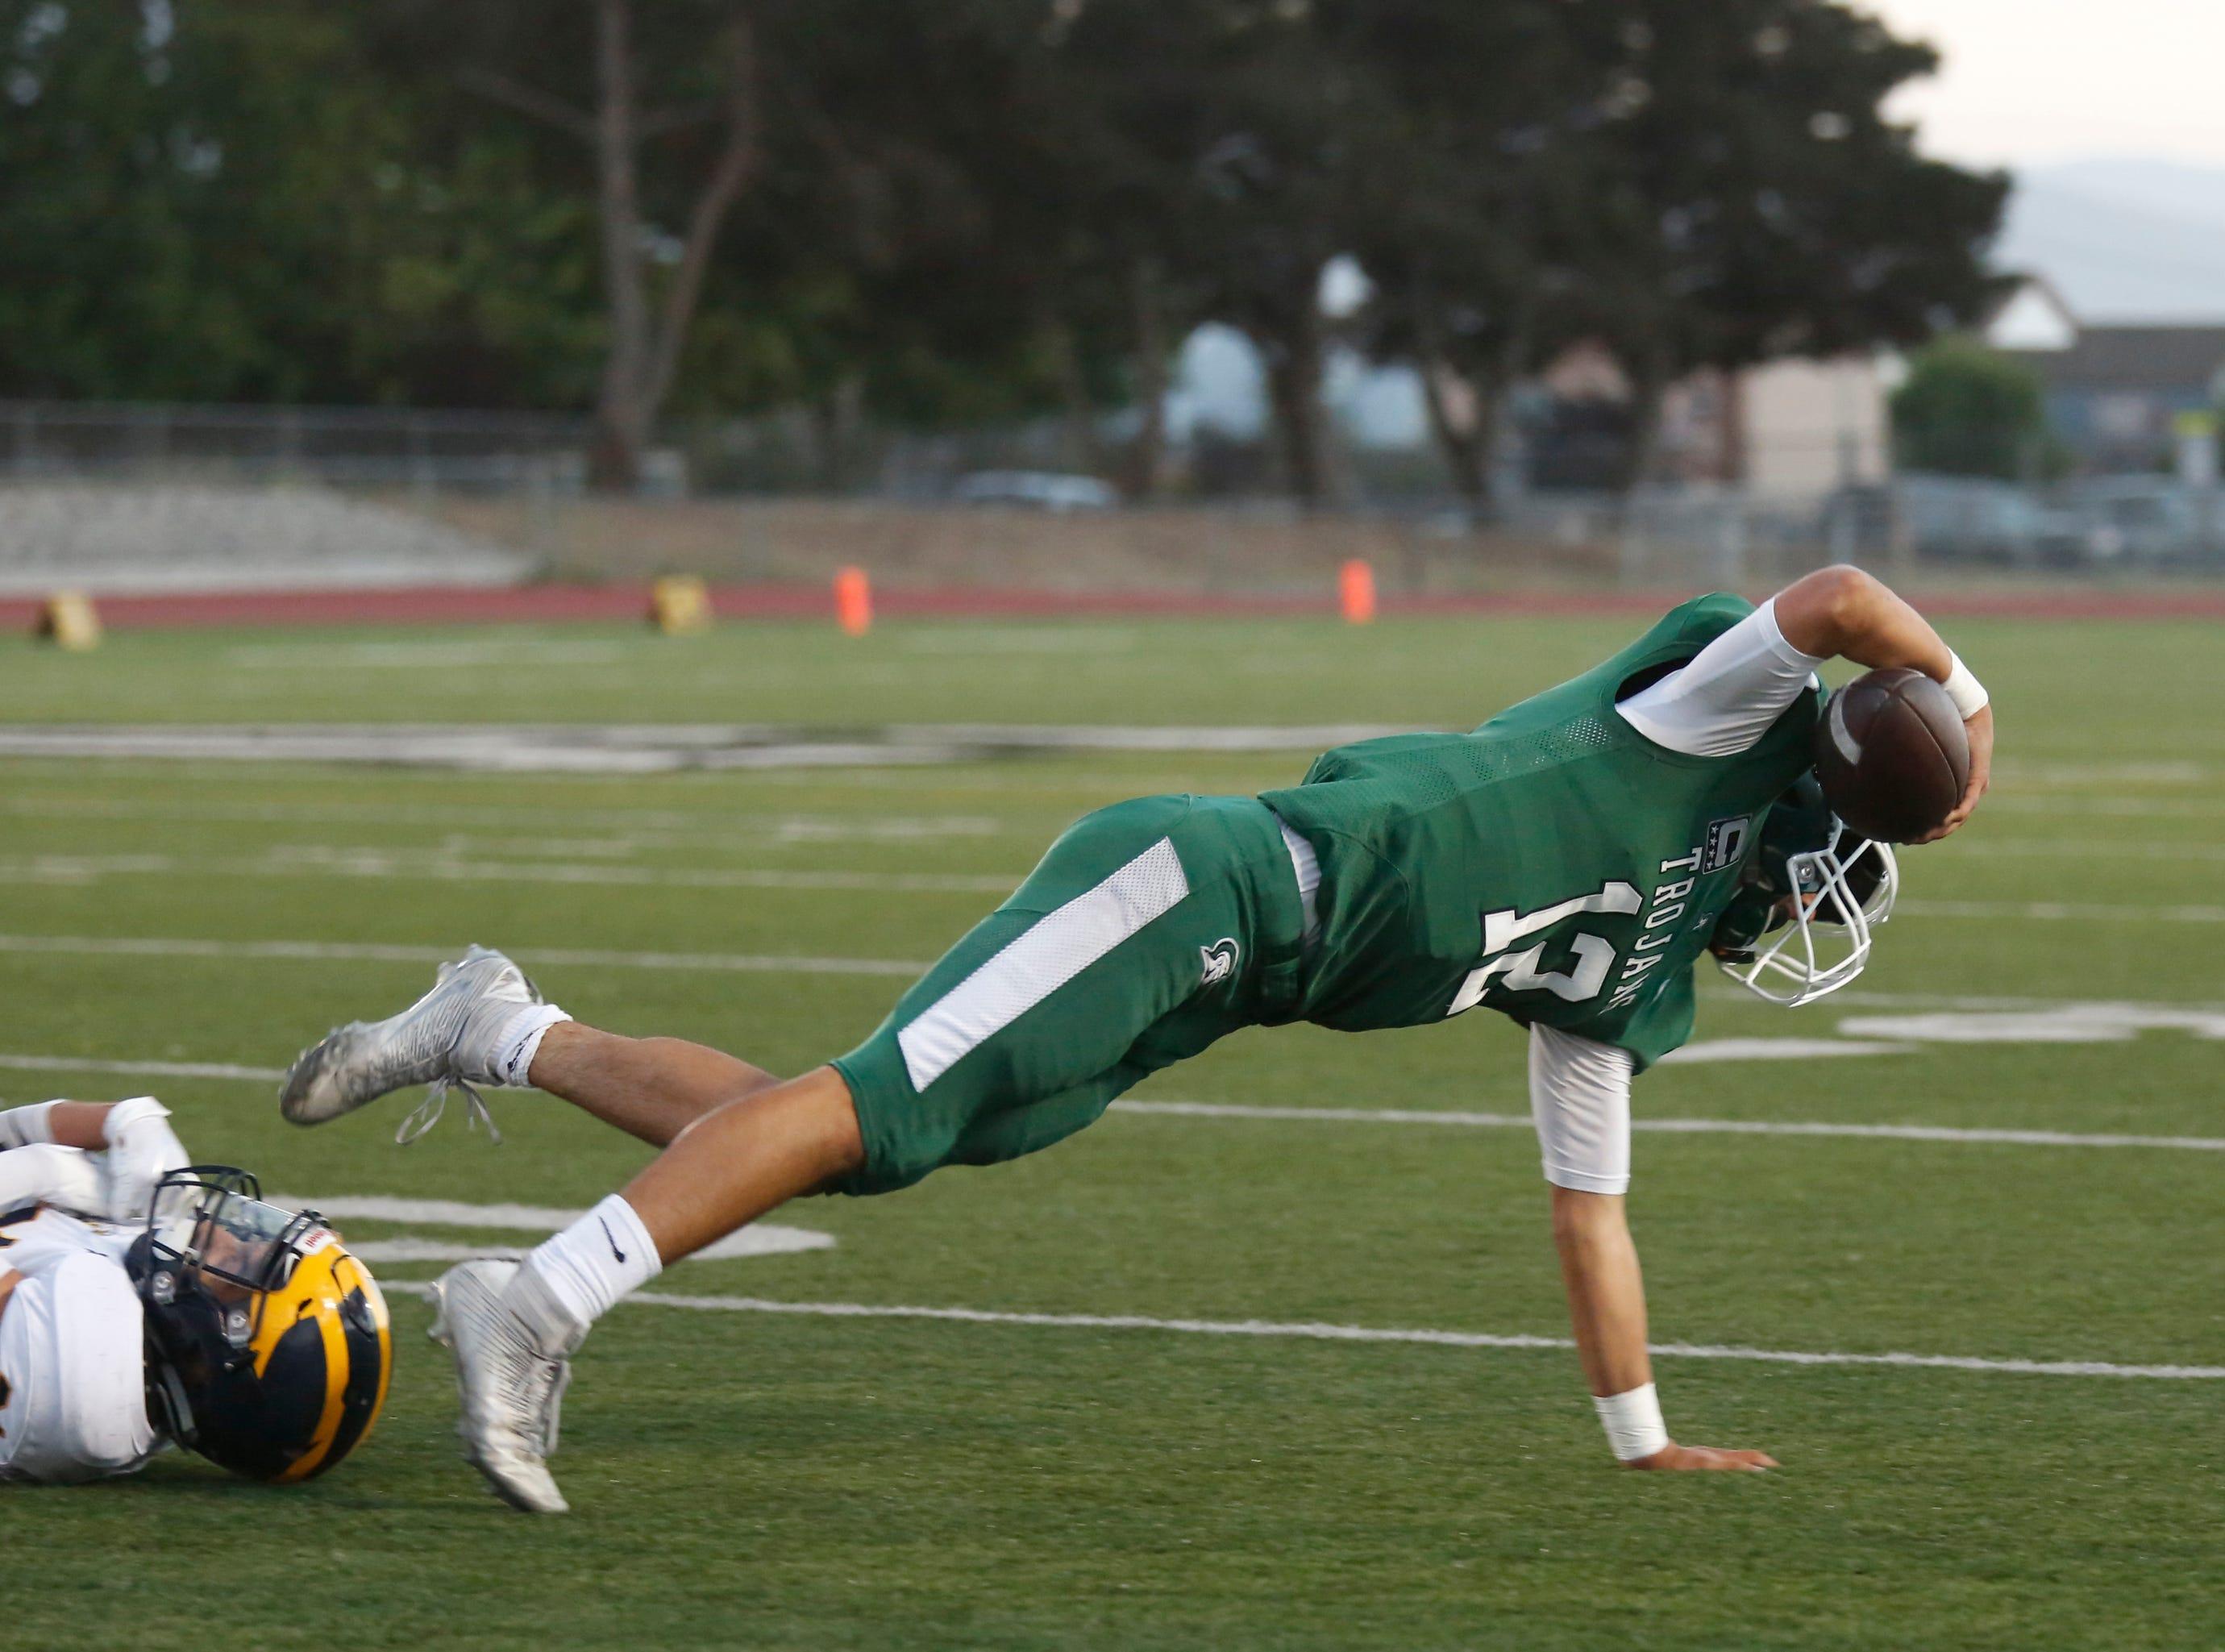 Alisal's quarterback Julian Renteria runs the ball against Everett Alvarez during football at Alisal High School in Salinas on Friday August 31, 2018. (Photo By David Royal)